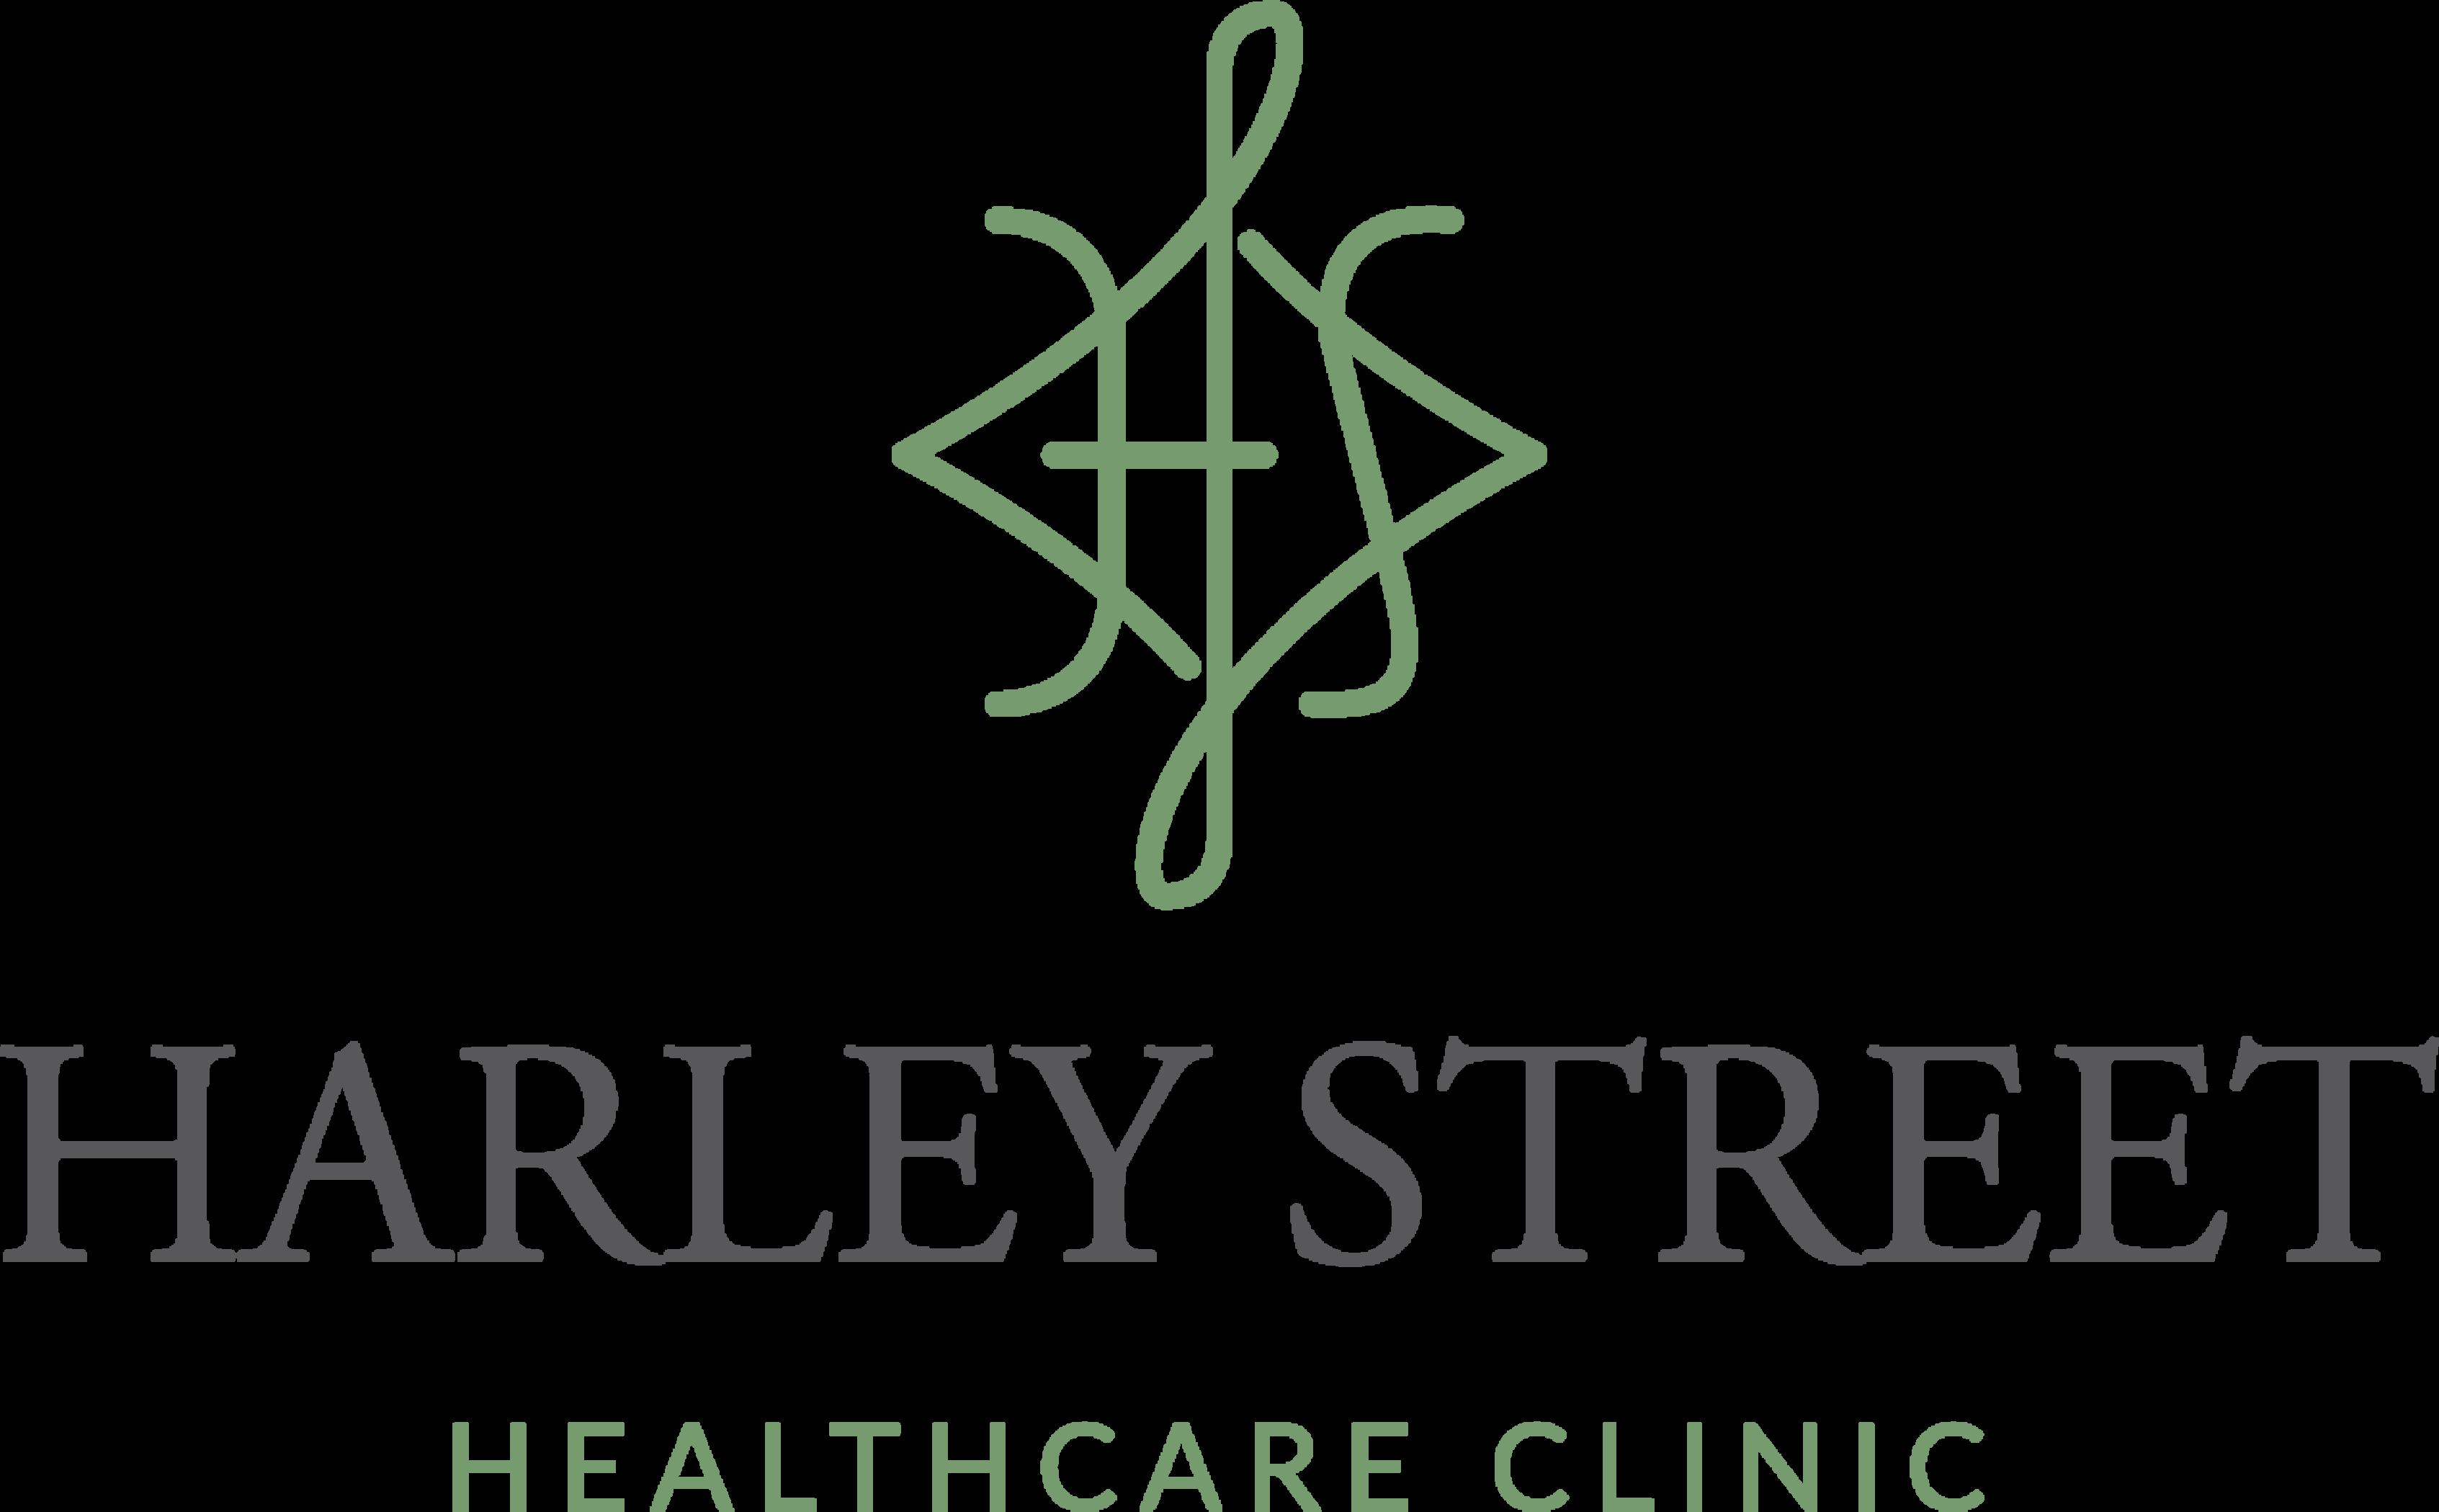 The Harley Street HealthCare Clinic